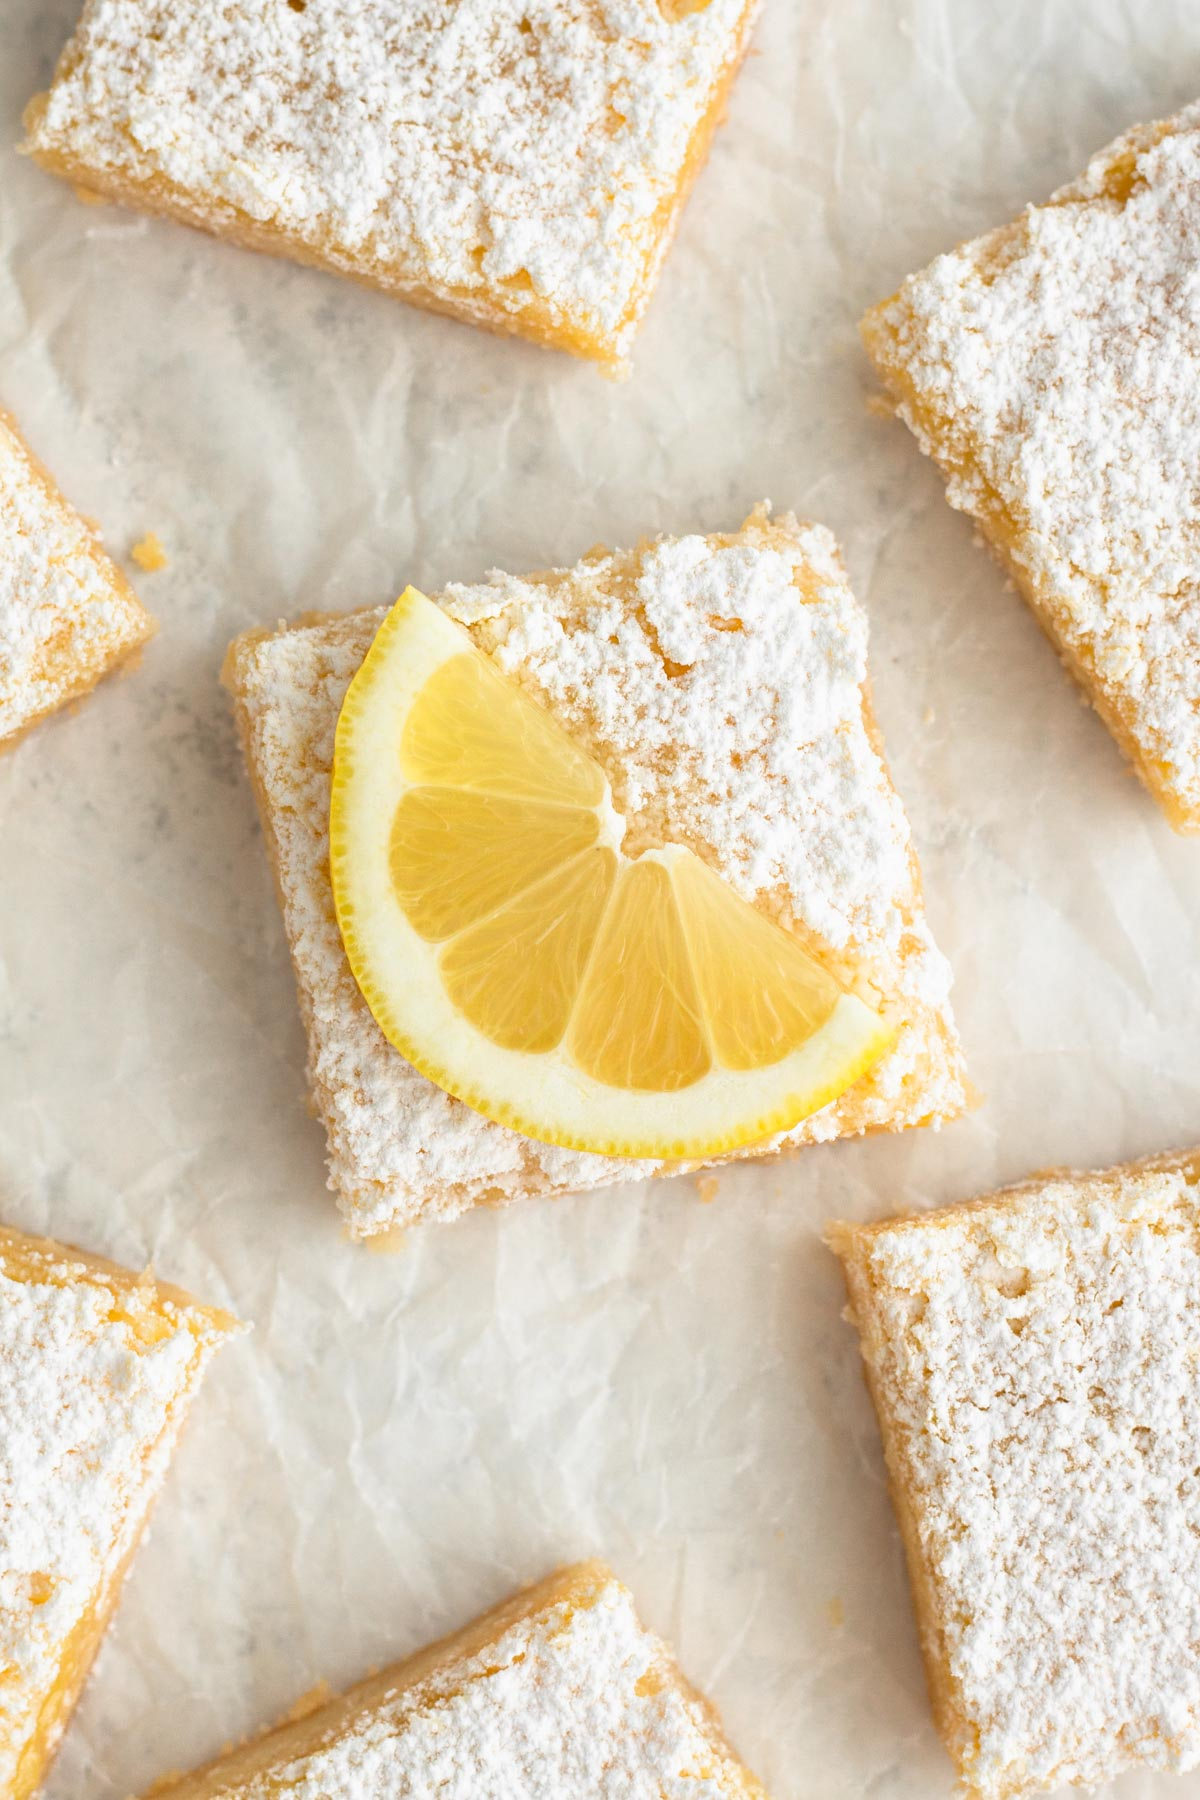 overhead view of a lemon bar and lemon slice on parchment paper